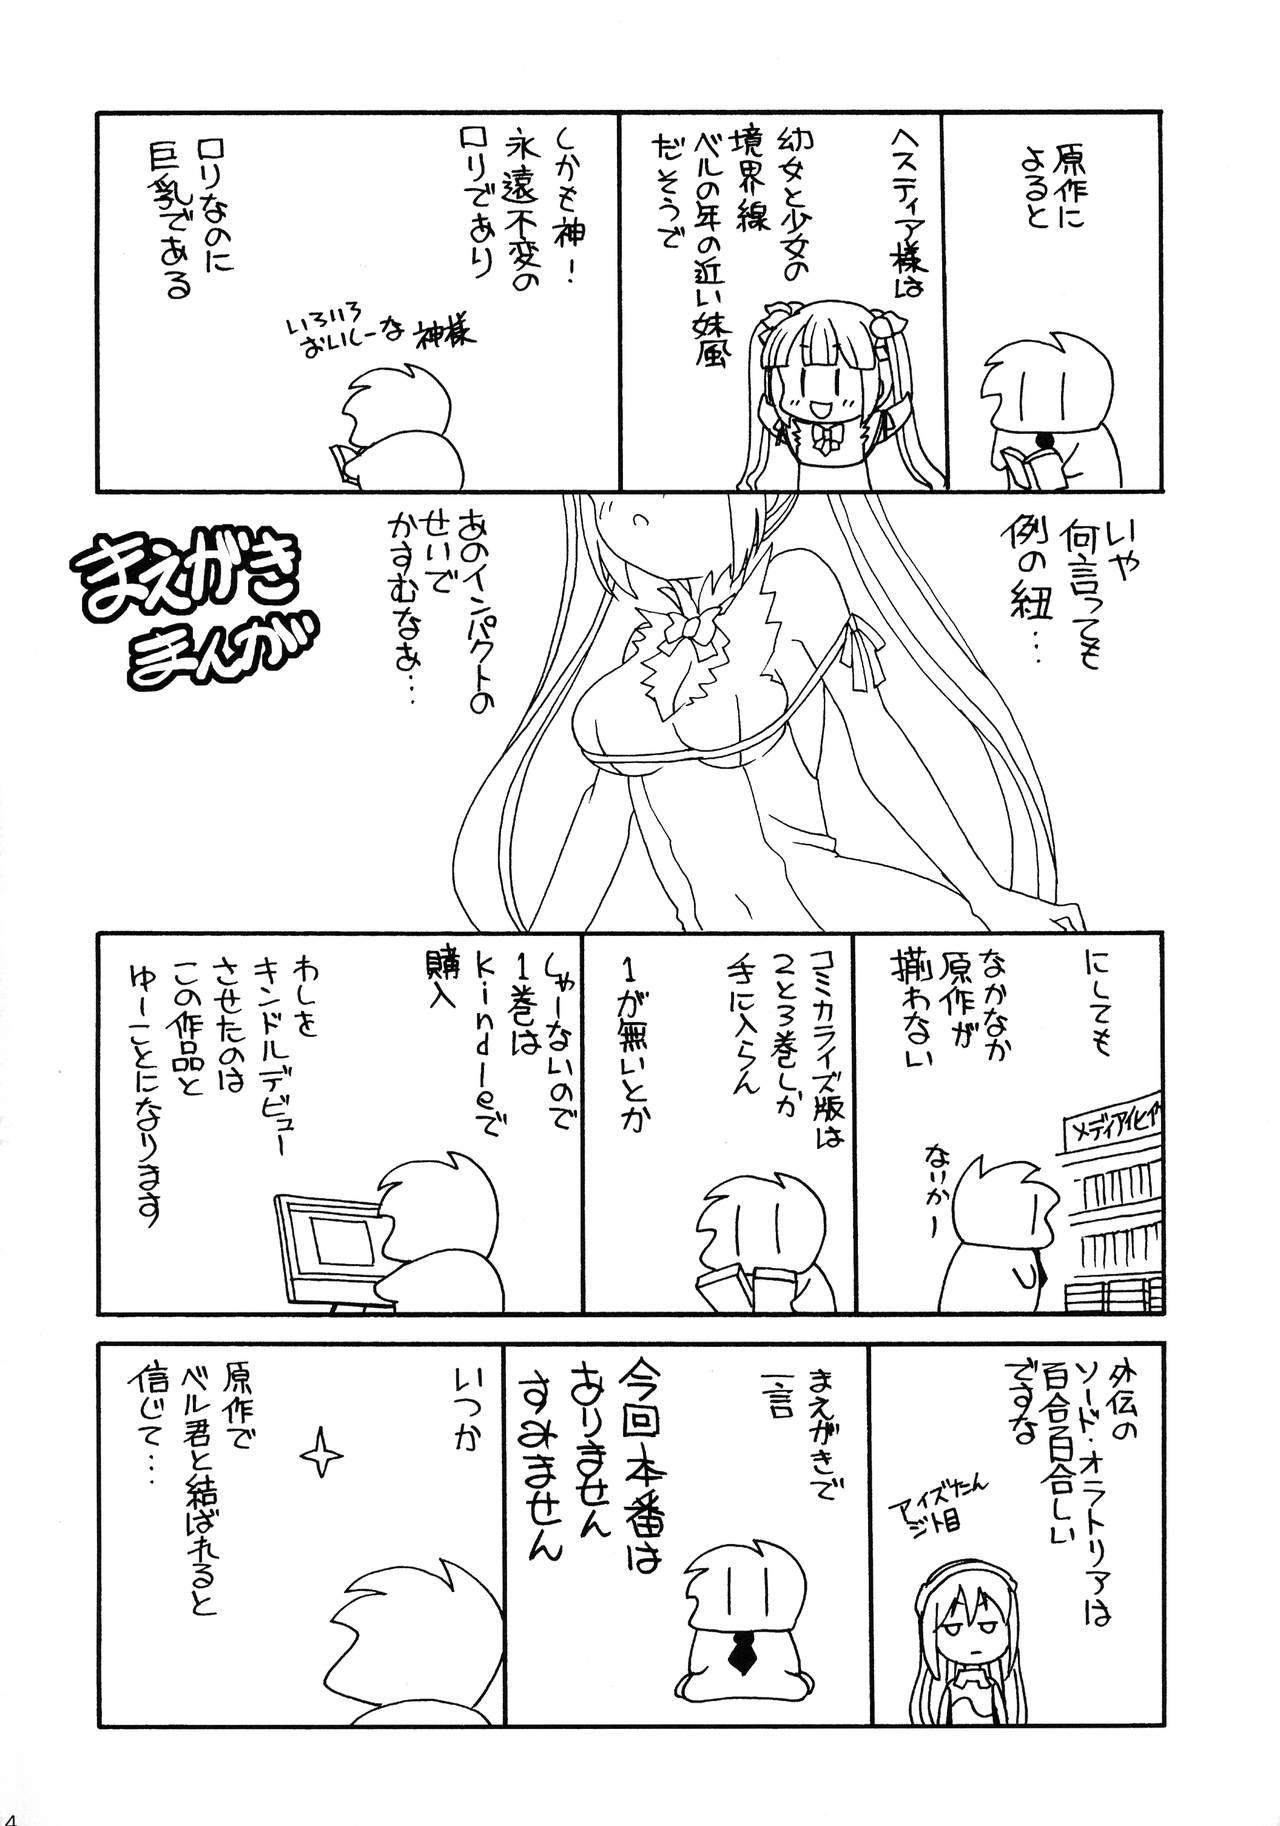 Loli Kami-sama wa Totsuzen Onanie 3